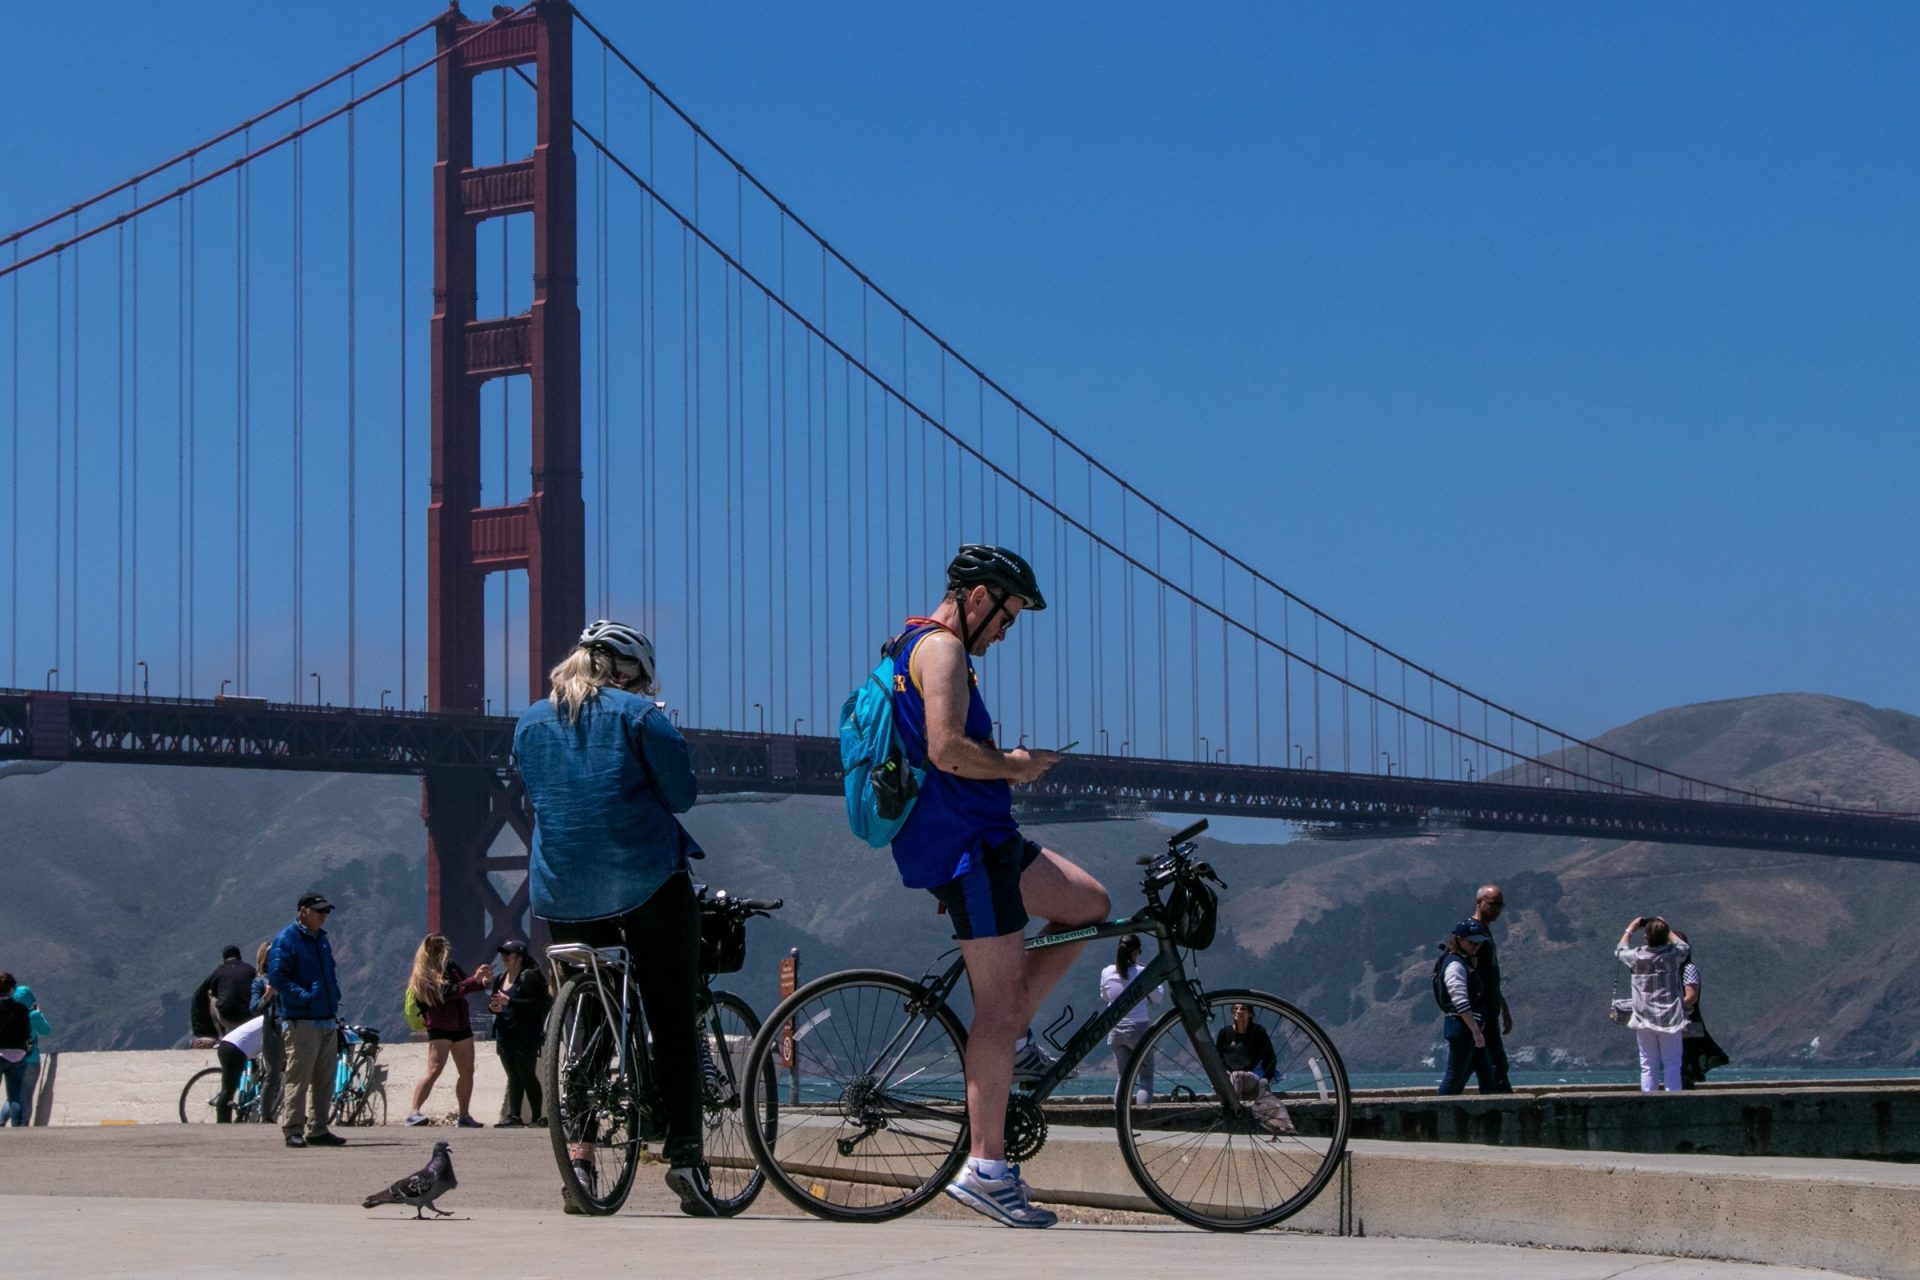 Cyclists Near The Golden Gate Bridge